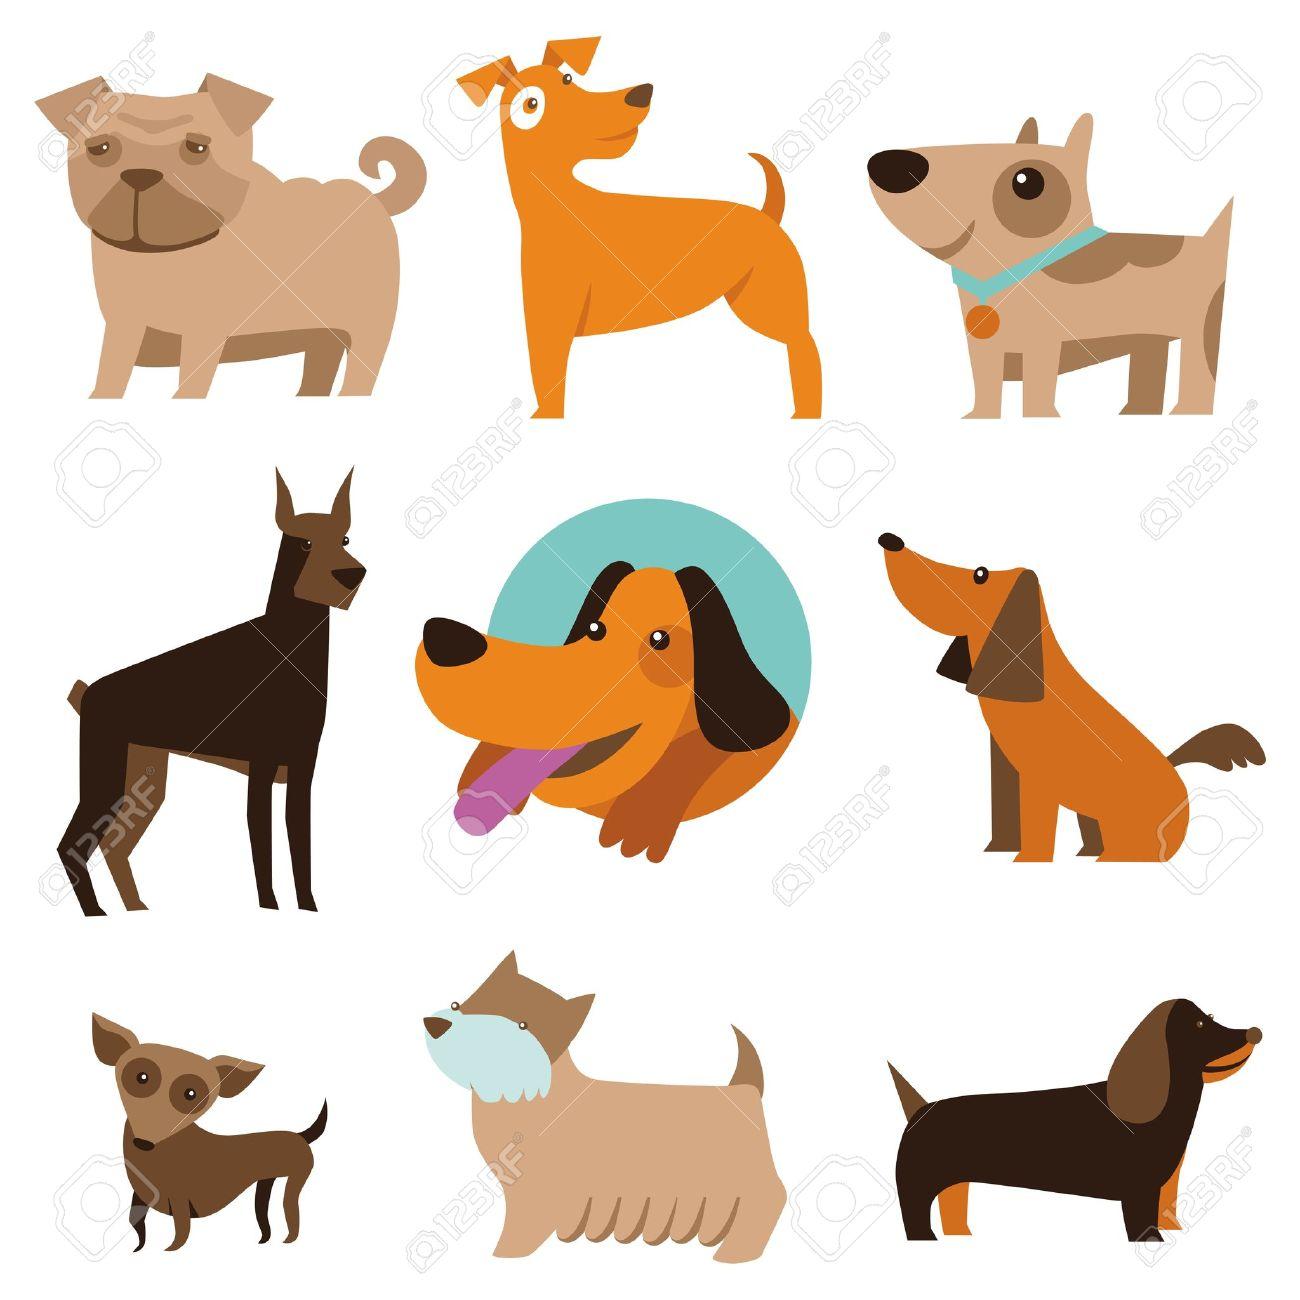 dog cartoon stock photos royalty free dog cartoon images and pictures